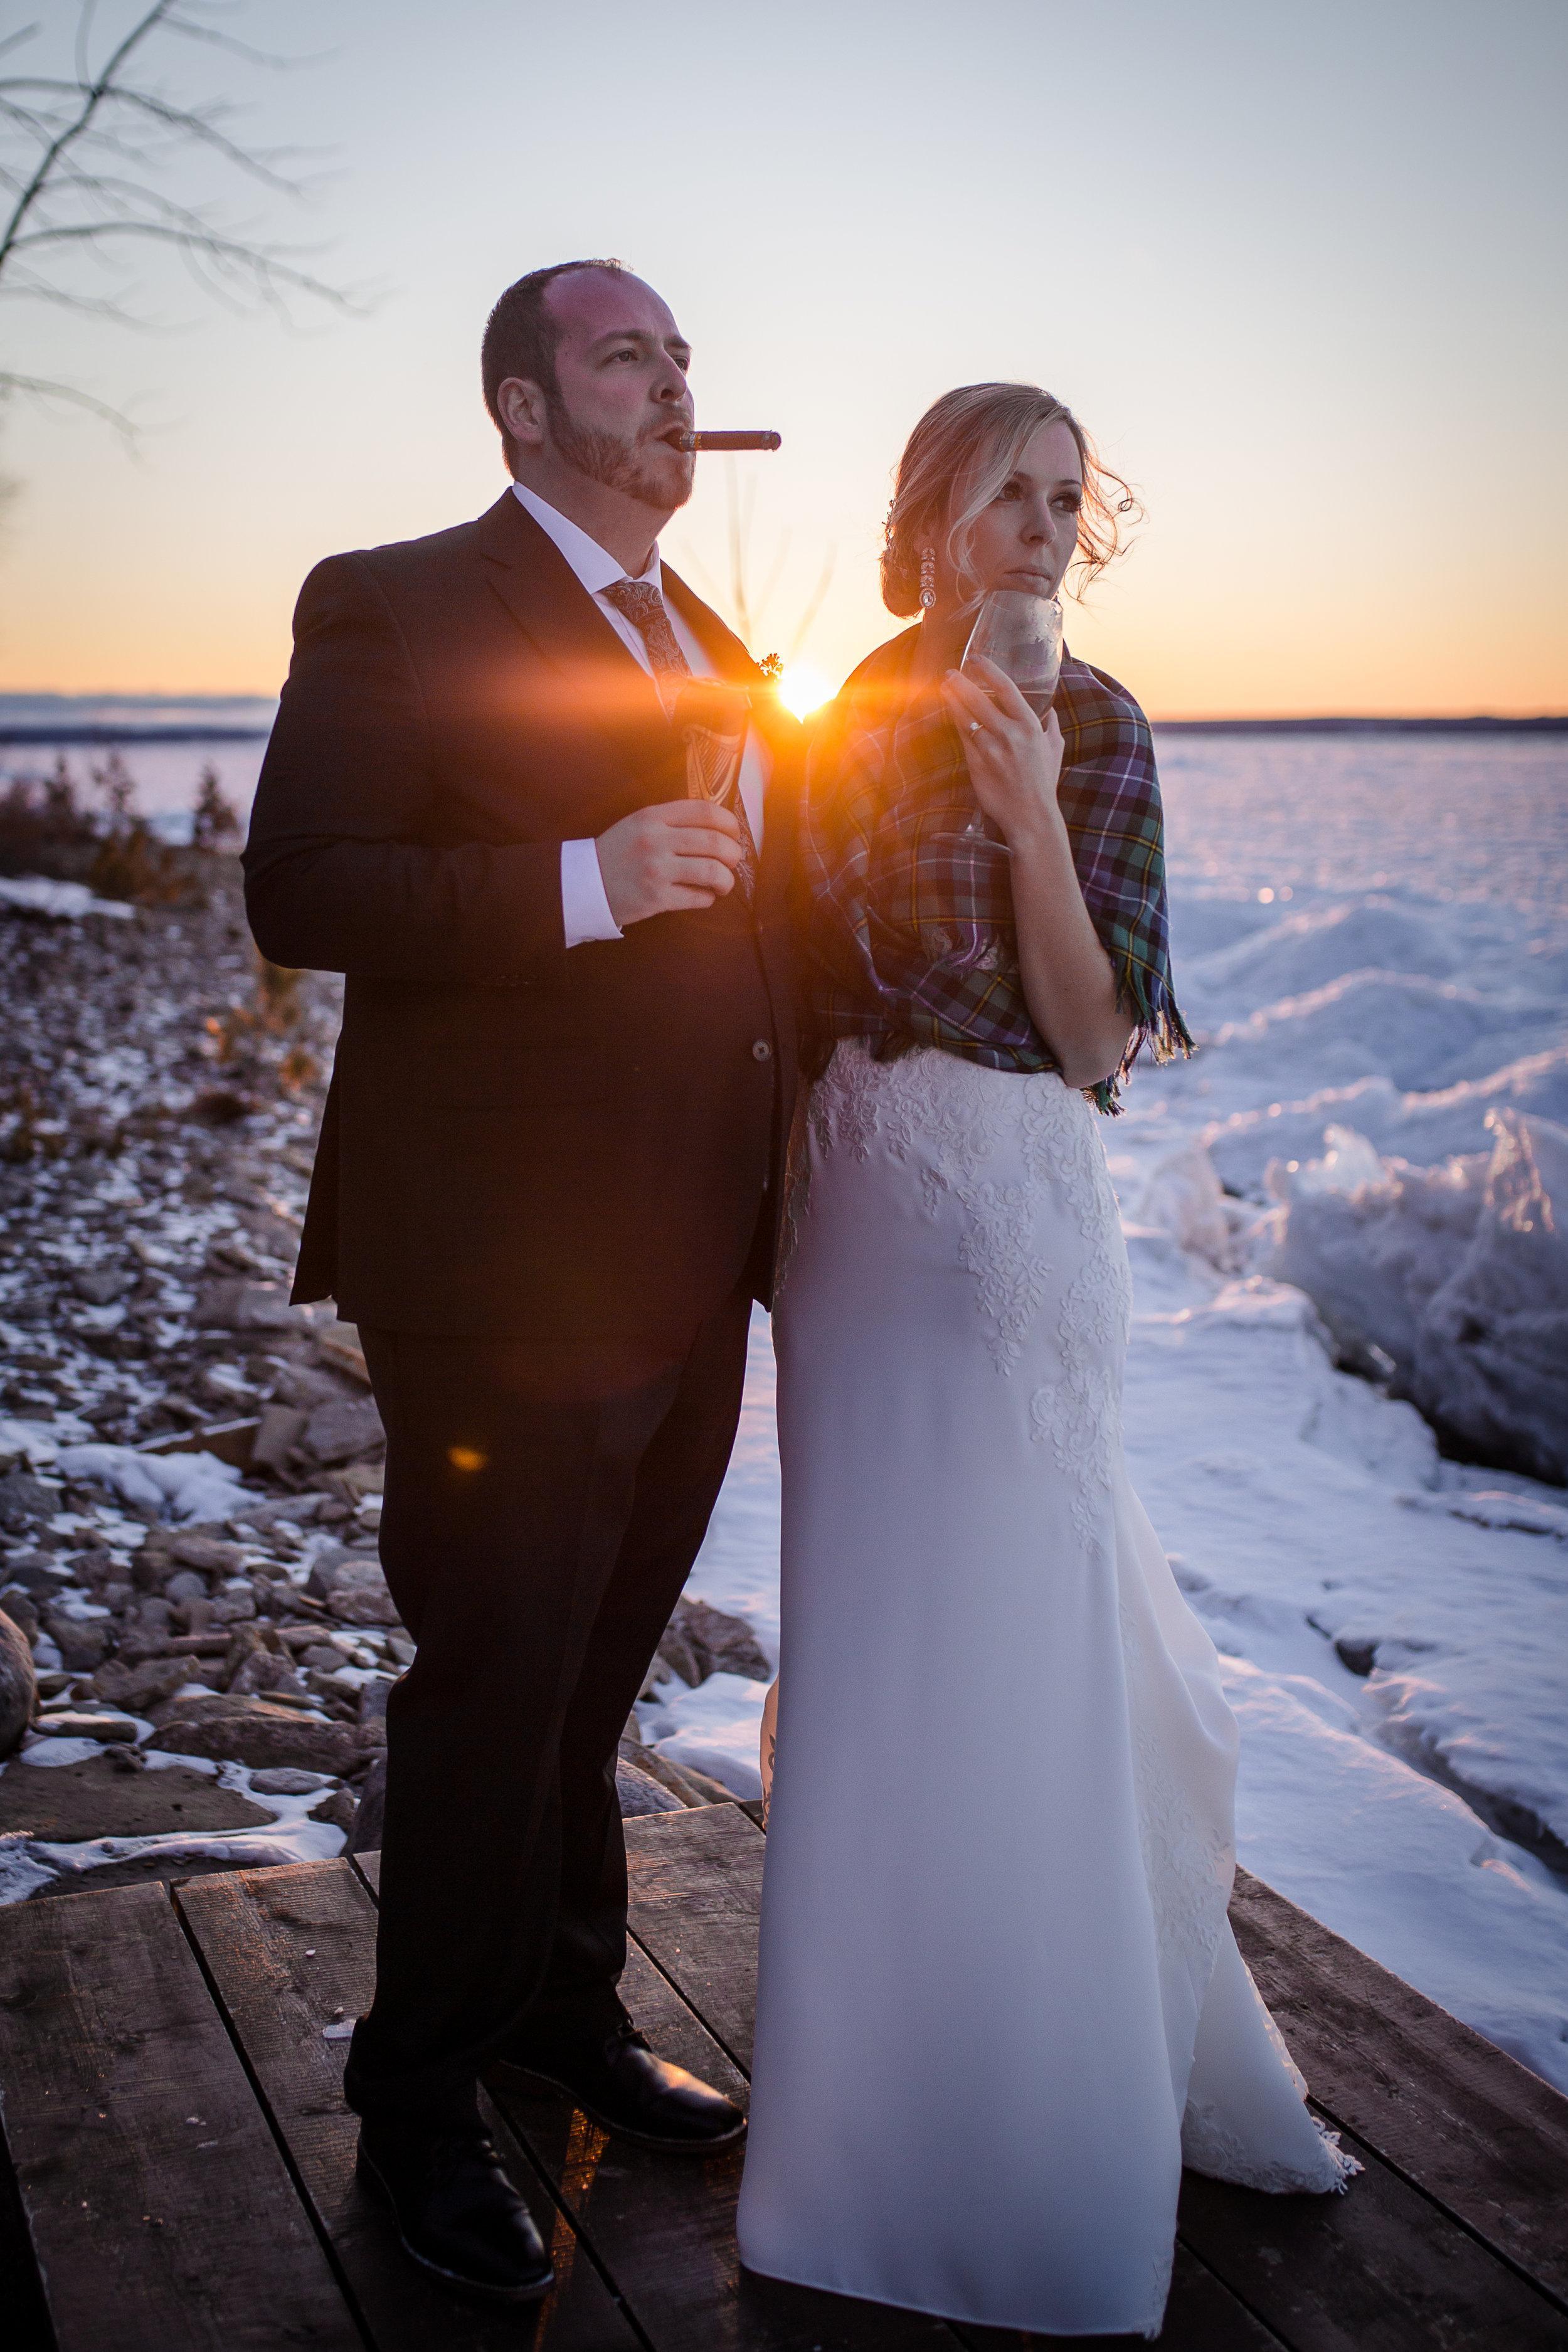 The-Griffiths-Wedding-10-03-10-255.jpg